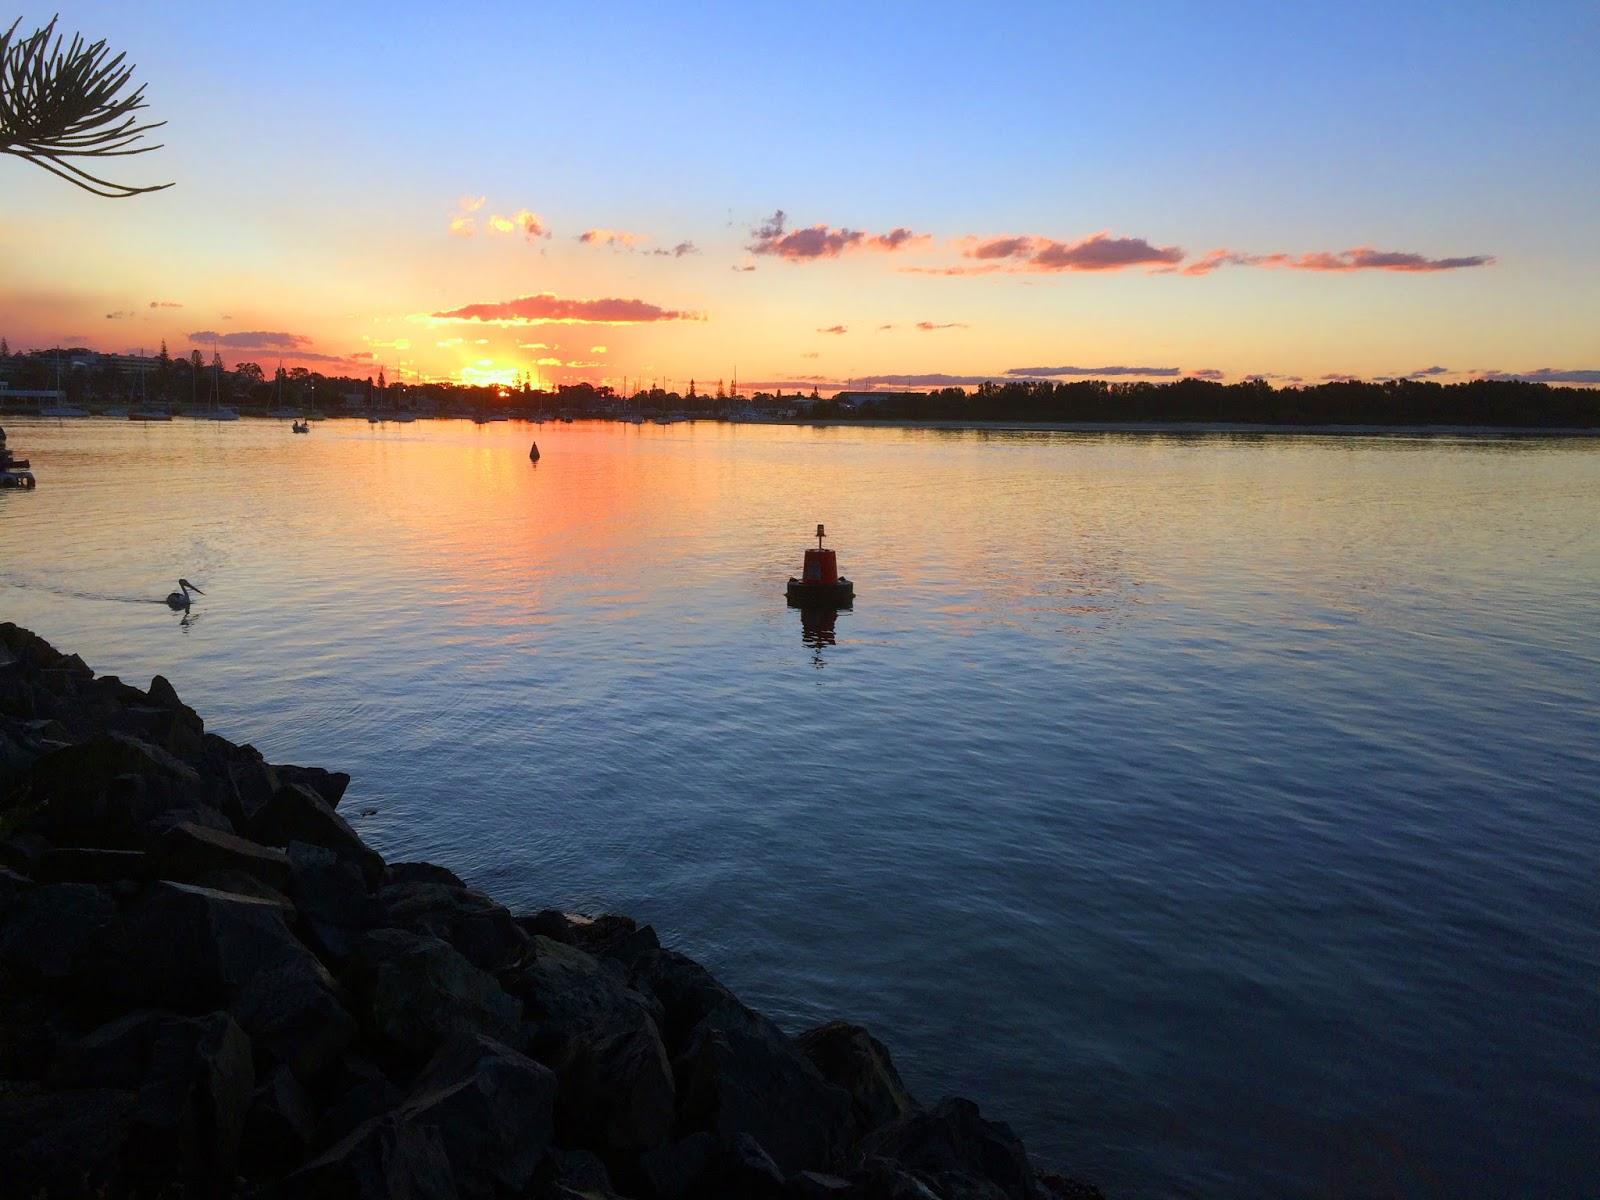 Sunset over river Port Macquarie